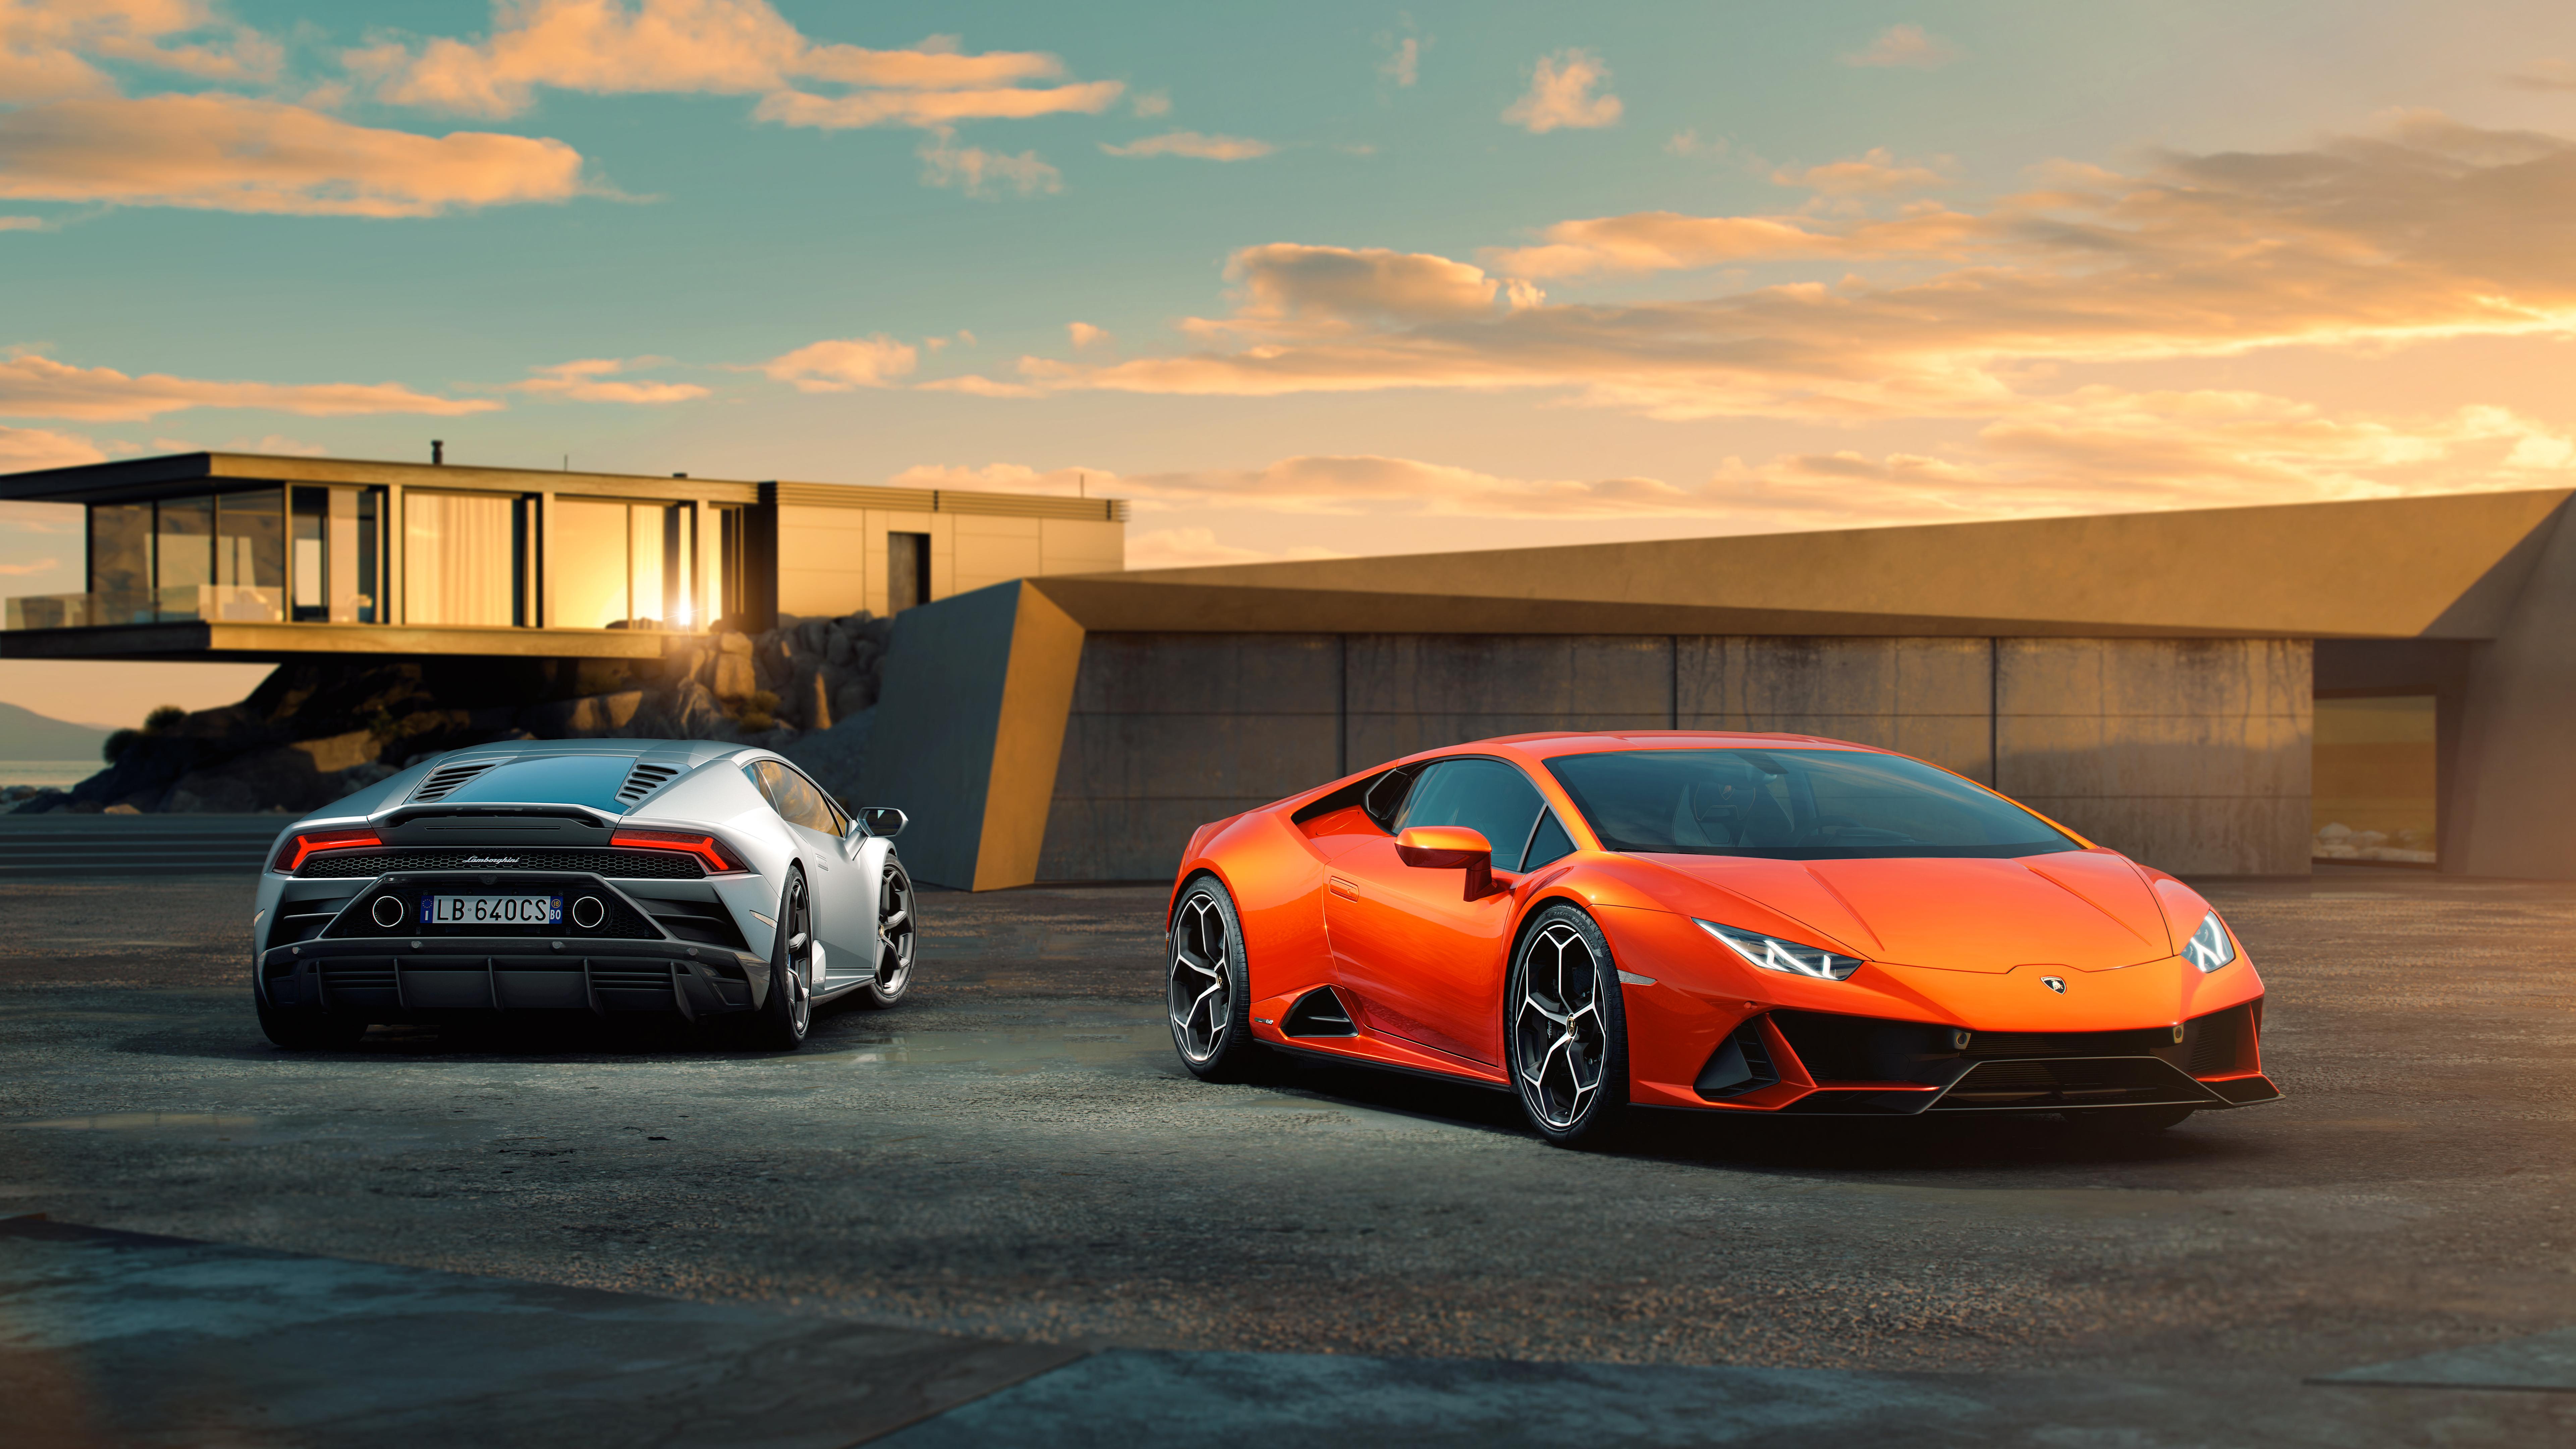 7680x4320 Lamborghini Huracan Evo 10k 2019 8k Hd 4k Wallpapers